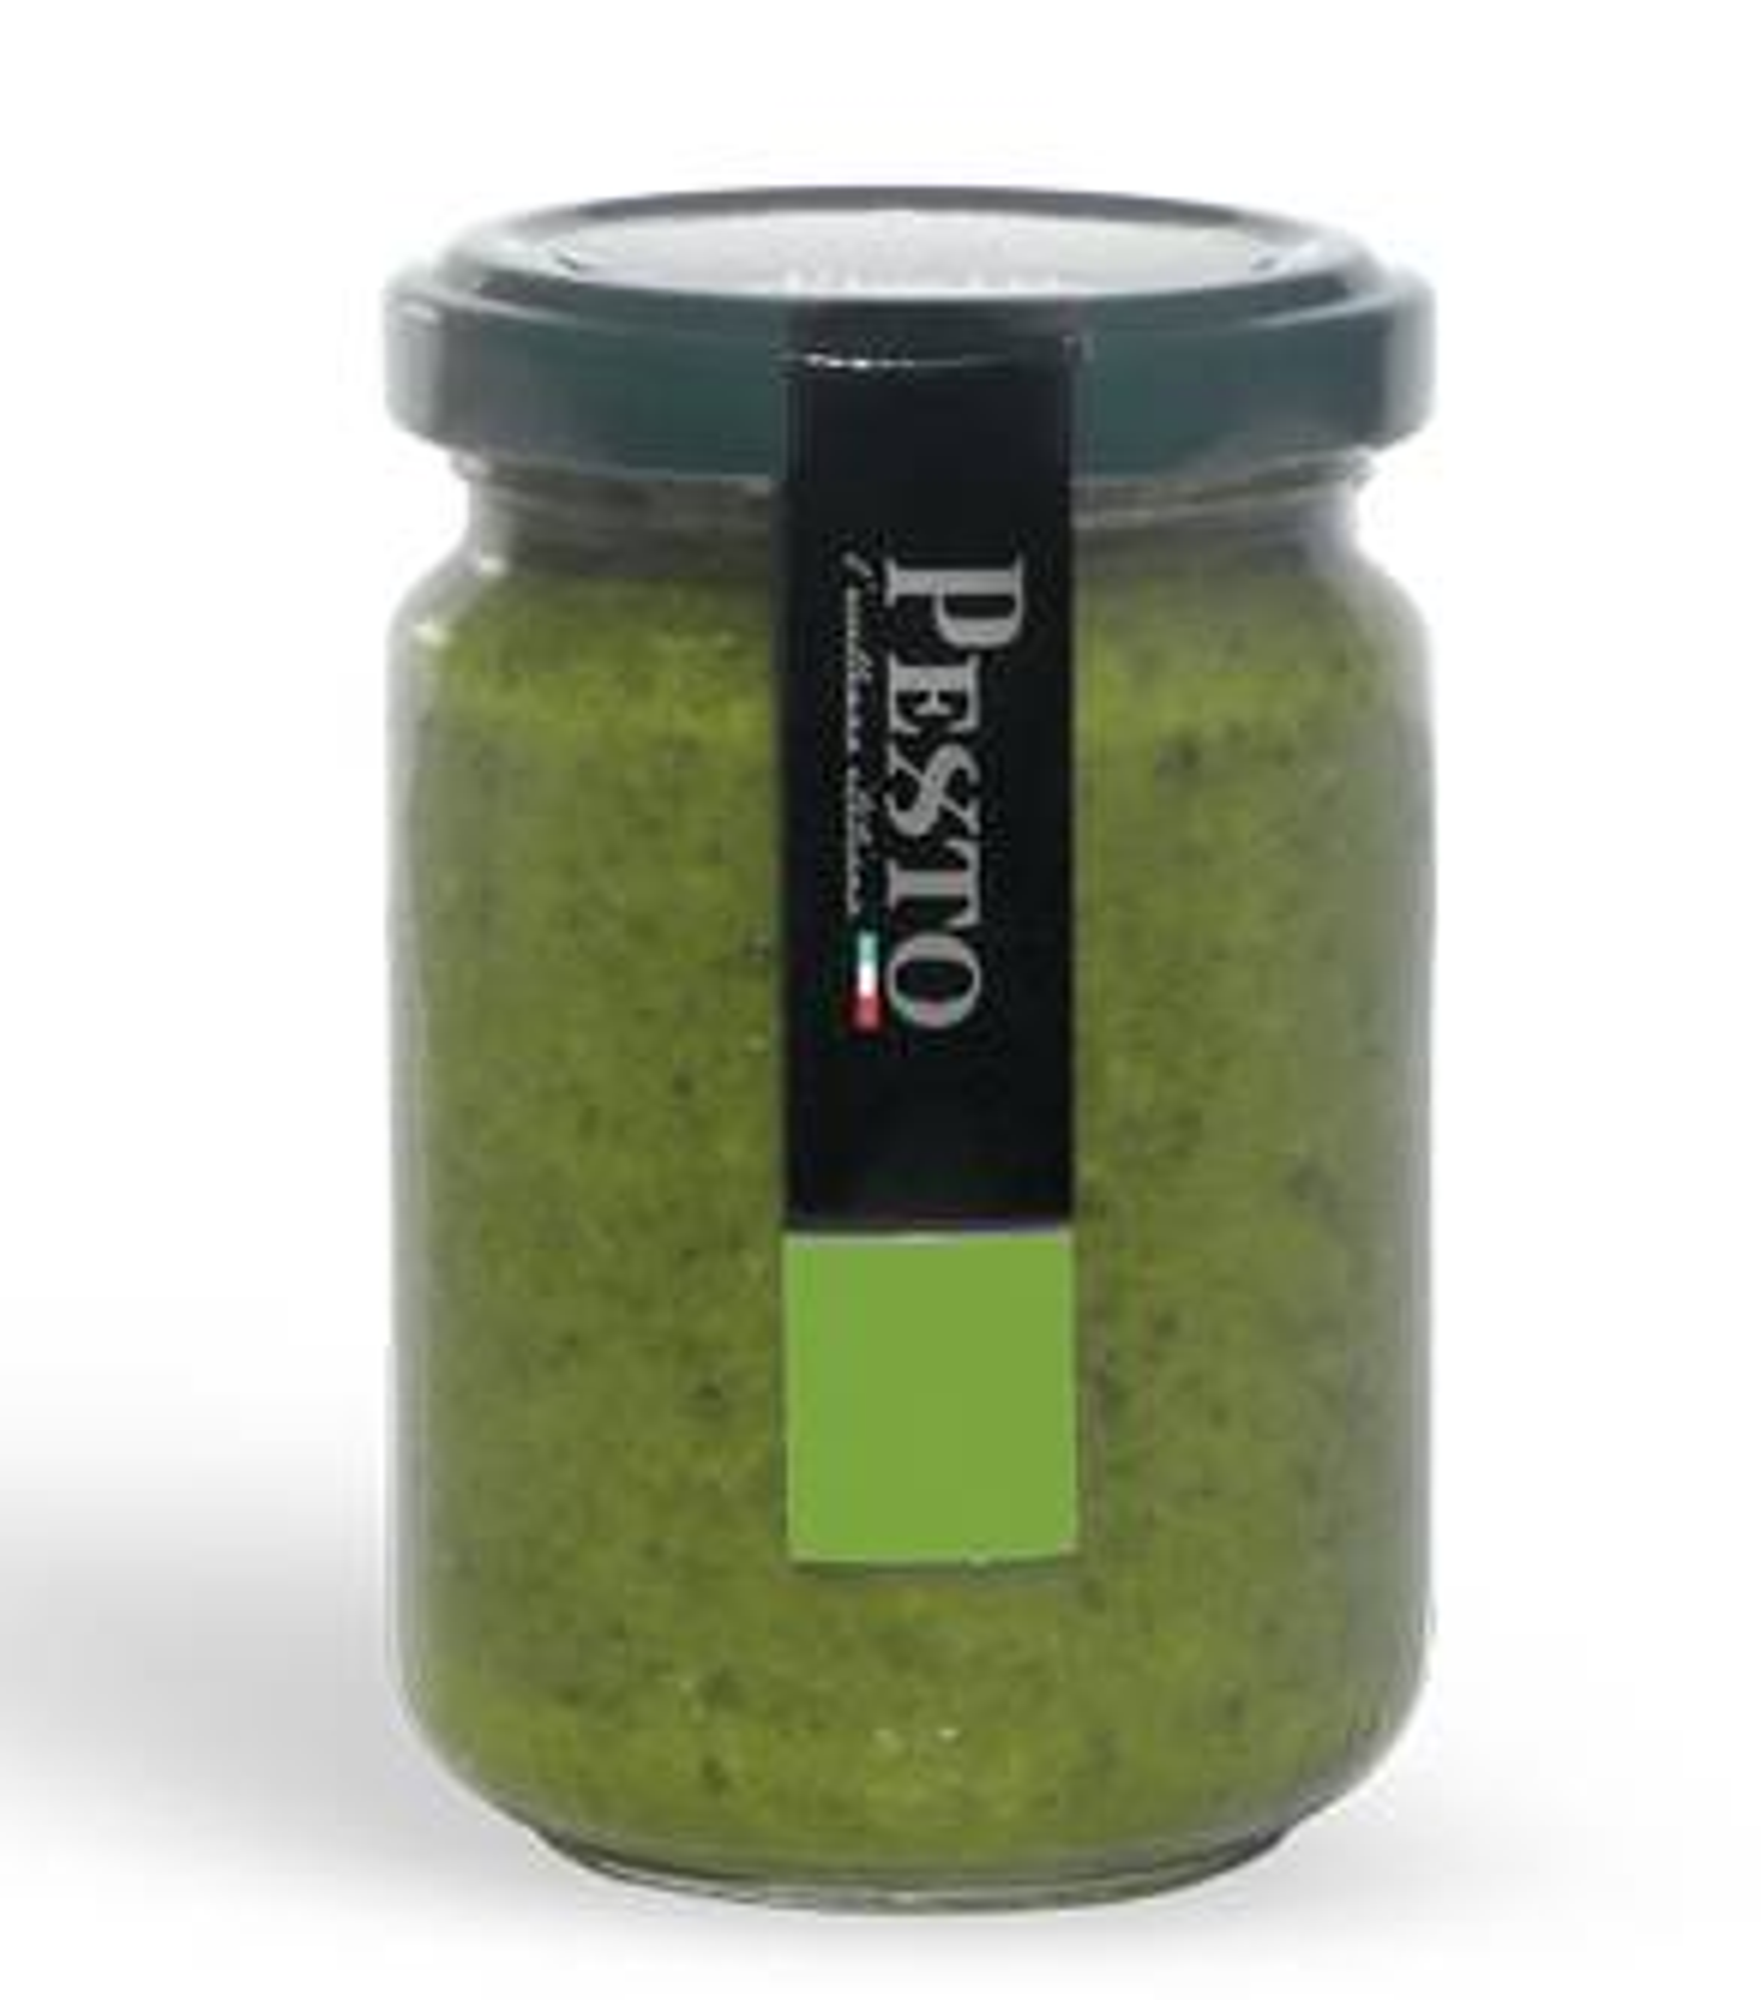 Frisches Pesto genovese ohne Knoblauch mit parmigiano reggiano 25 monate - Pexto per Amore